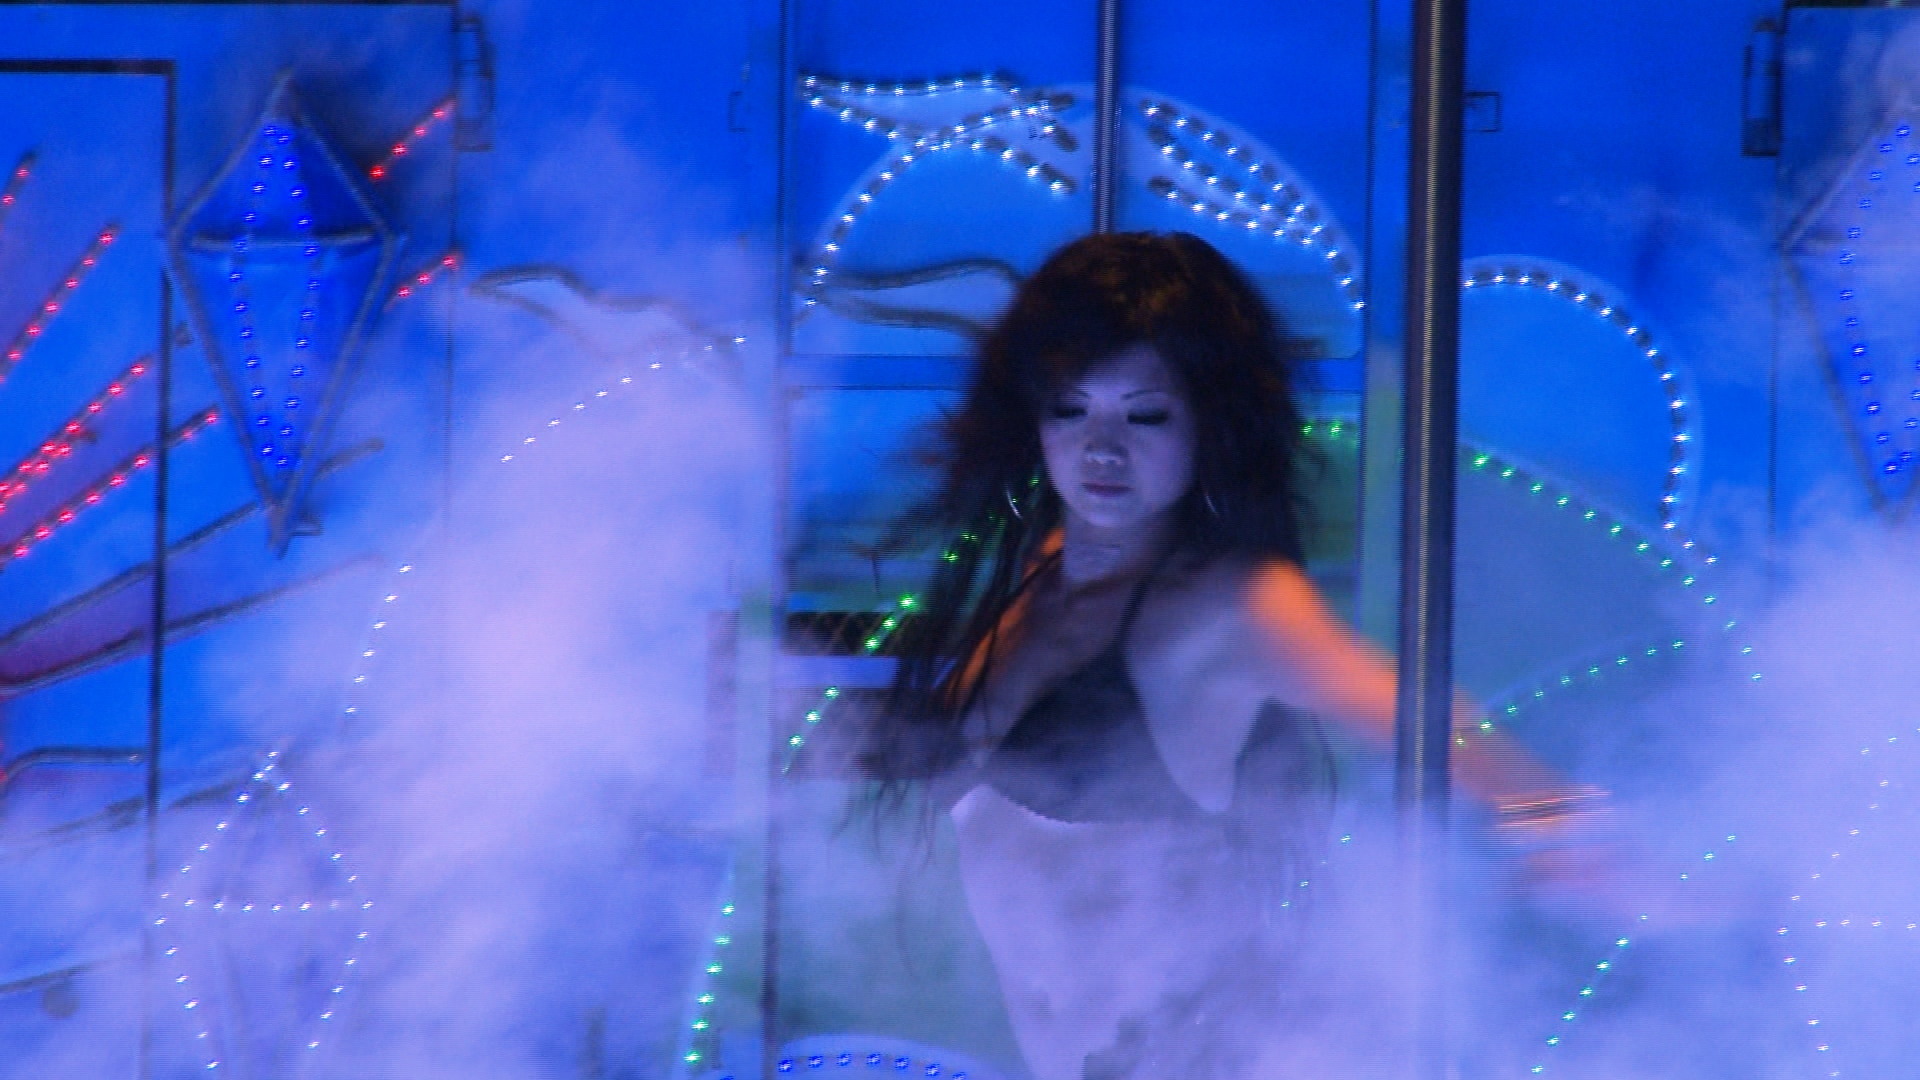 Jessica biel powder blue compilation - 3 part 1